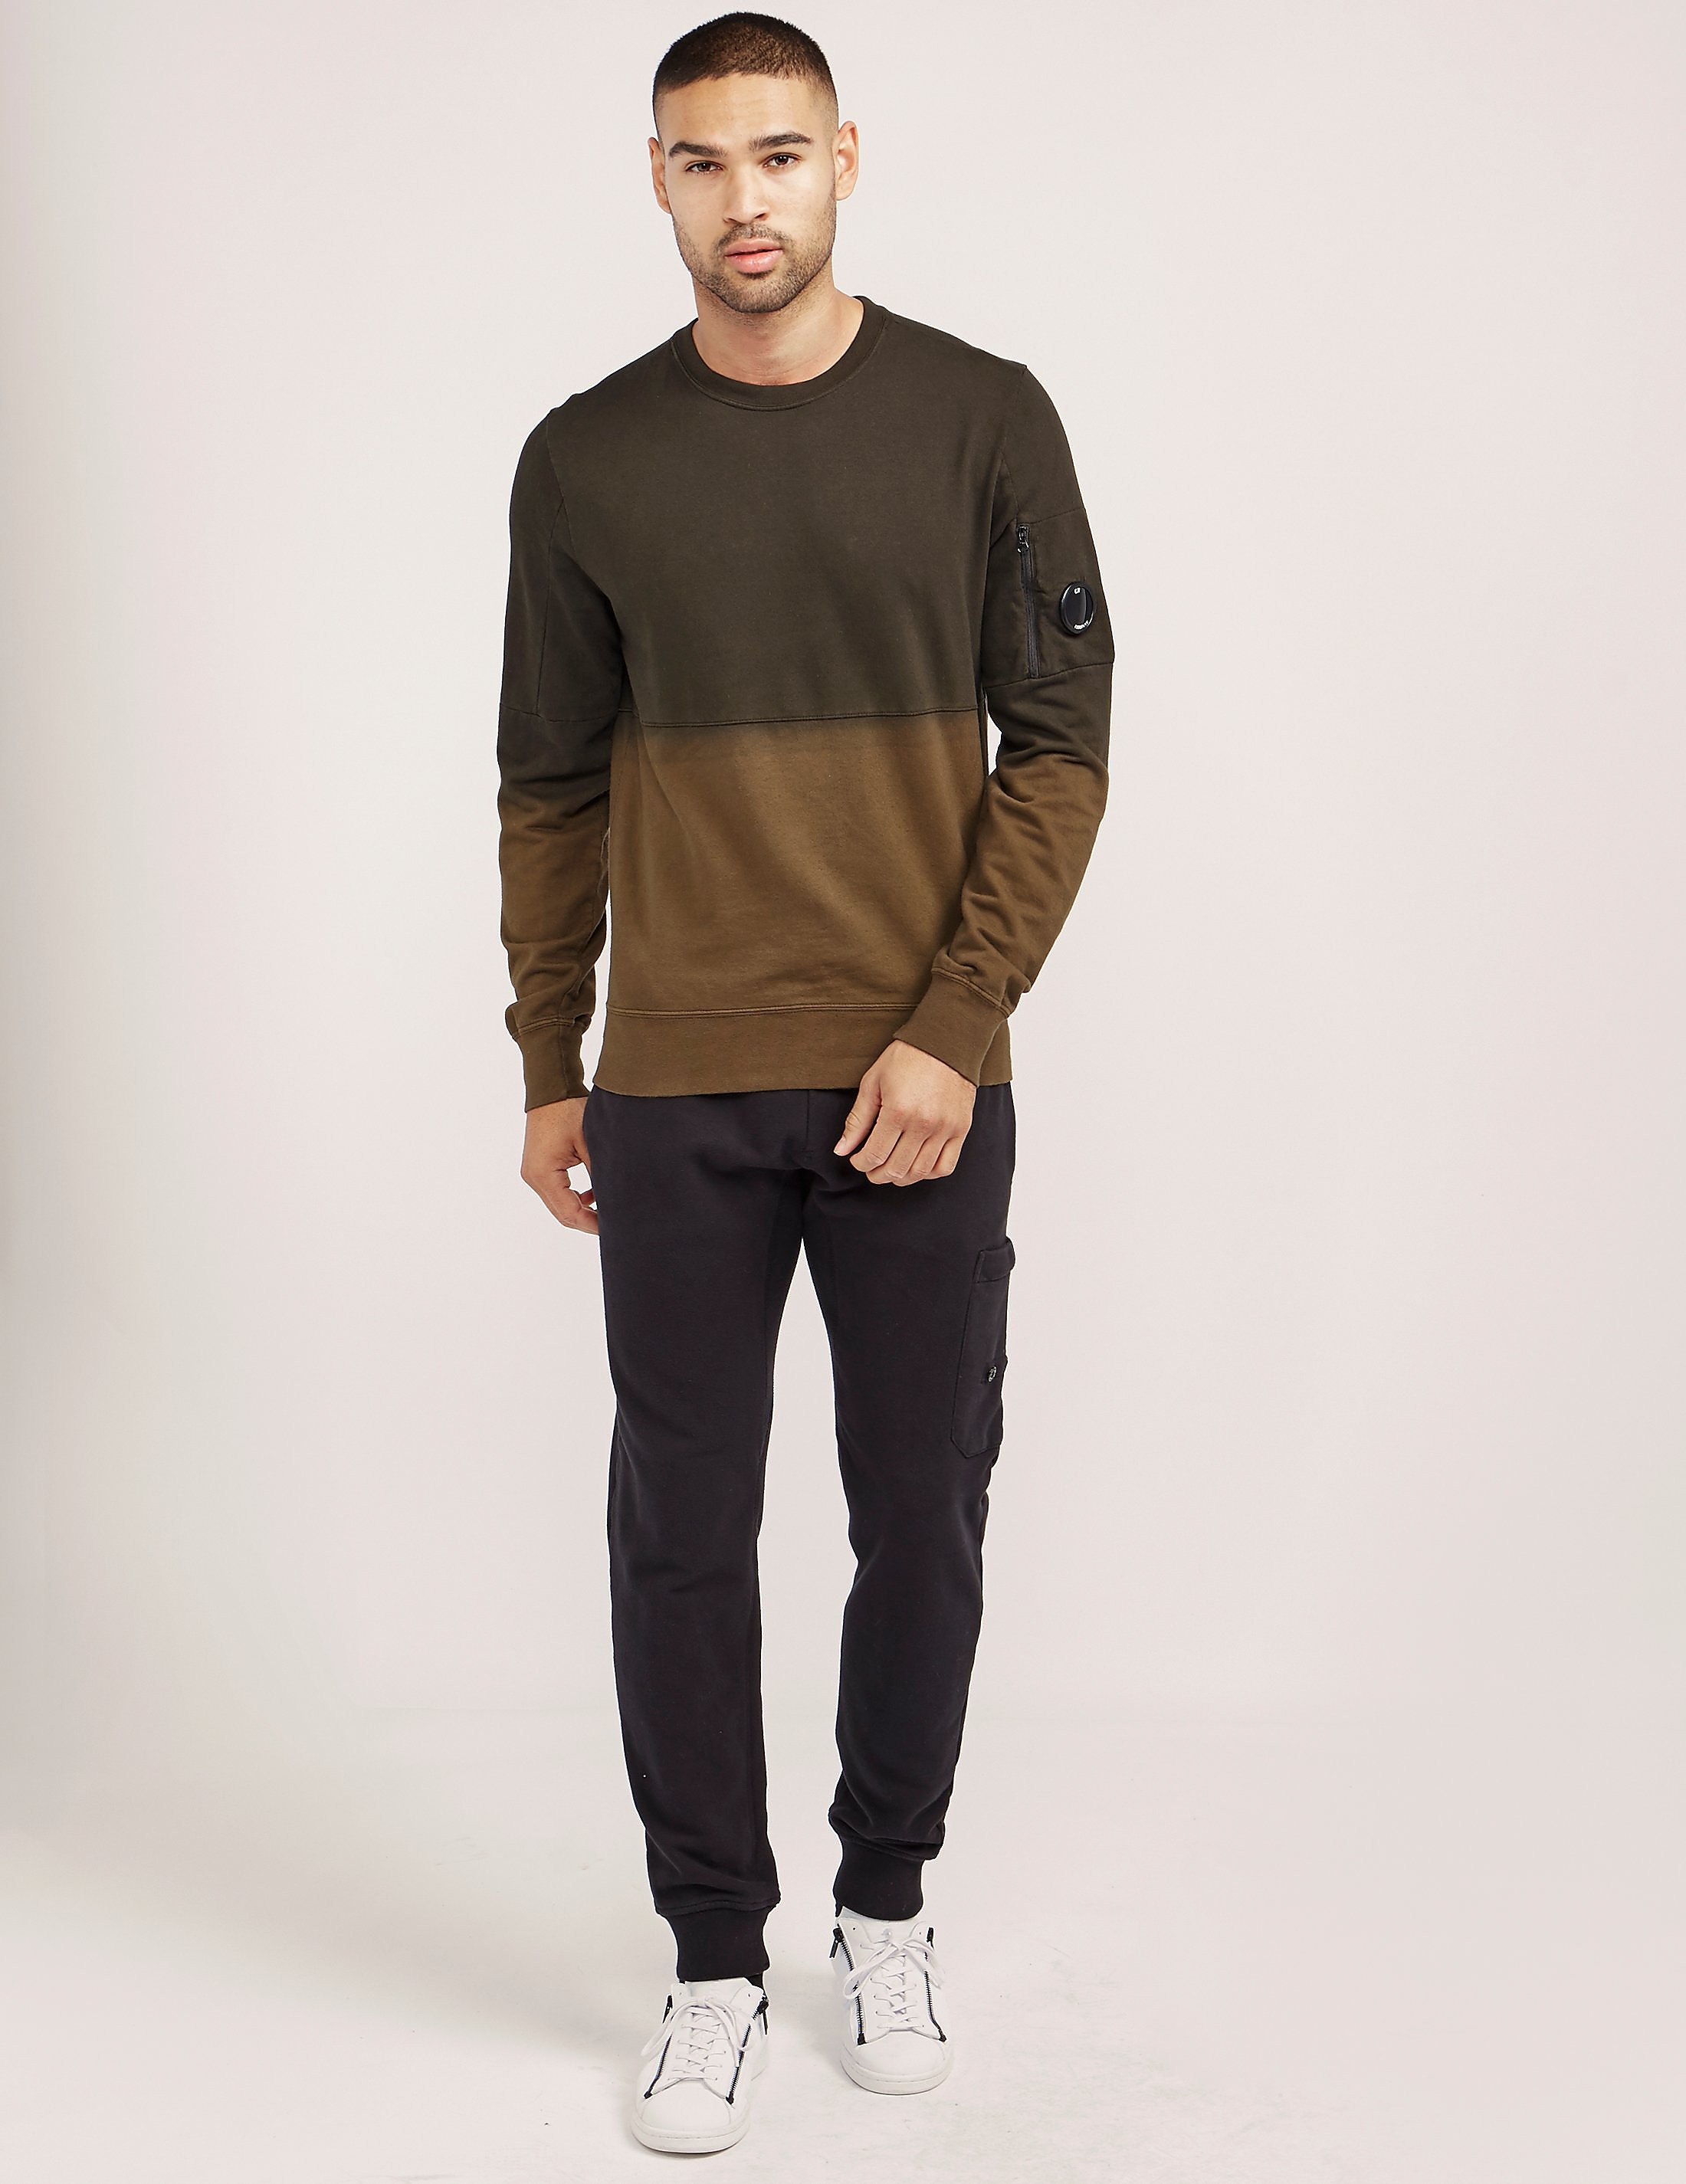 CP Company Dip Dye Crew Neck Sweatshirt